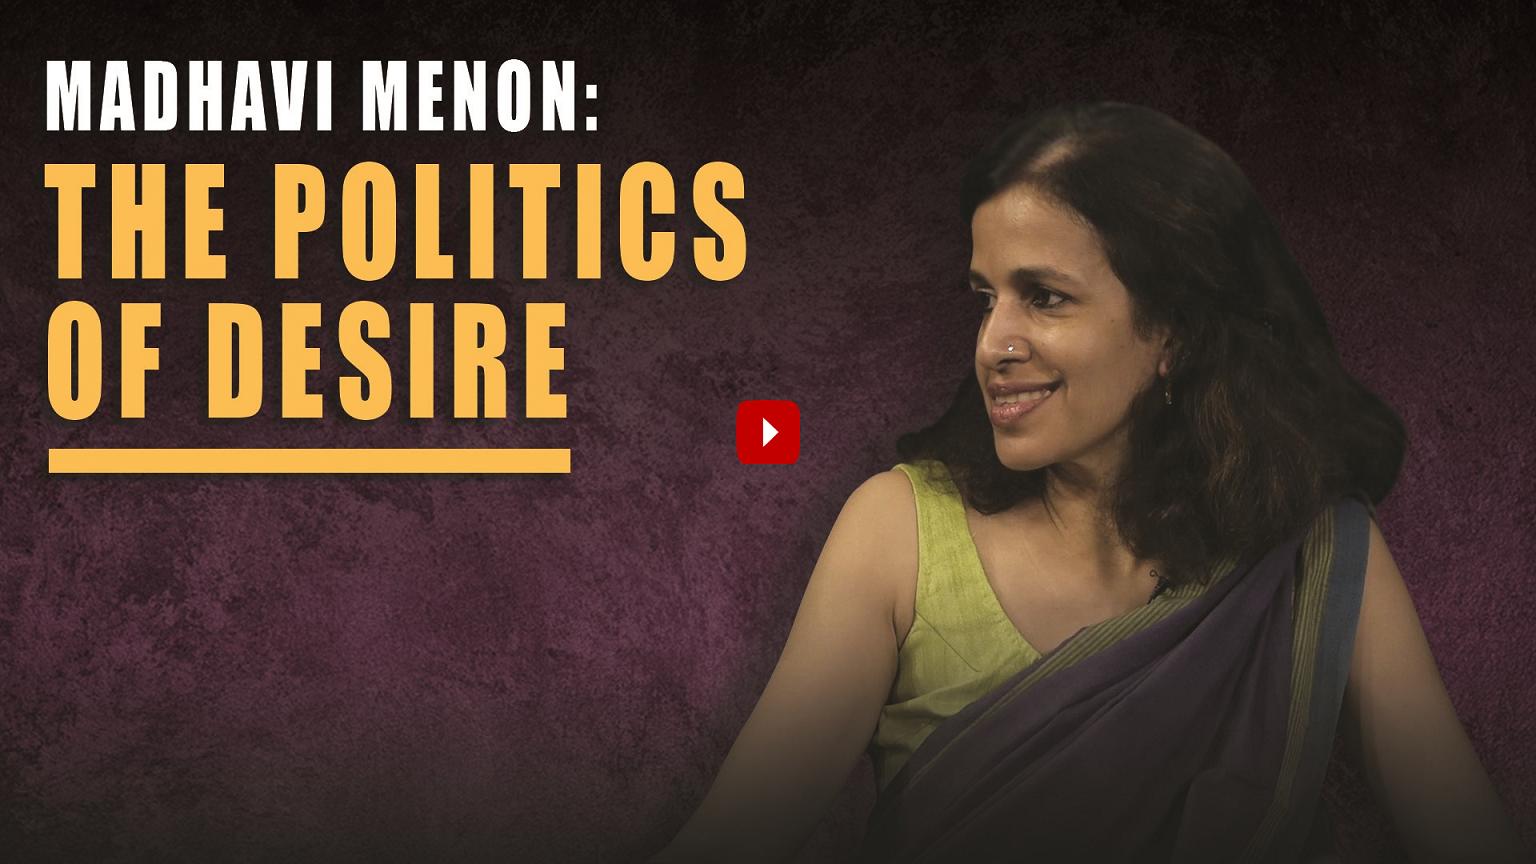 The Politics of Desire